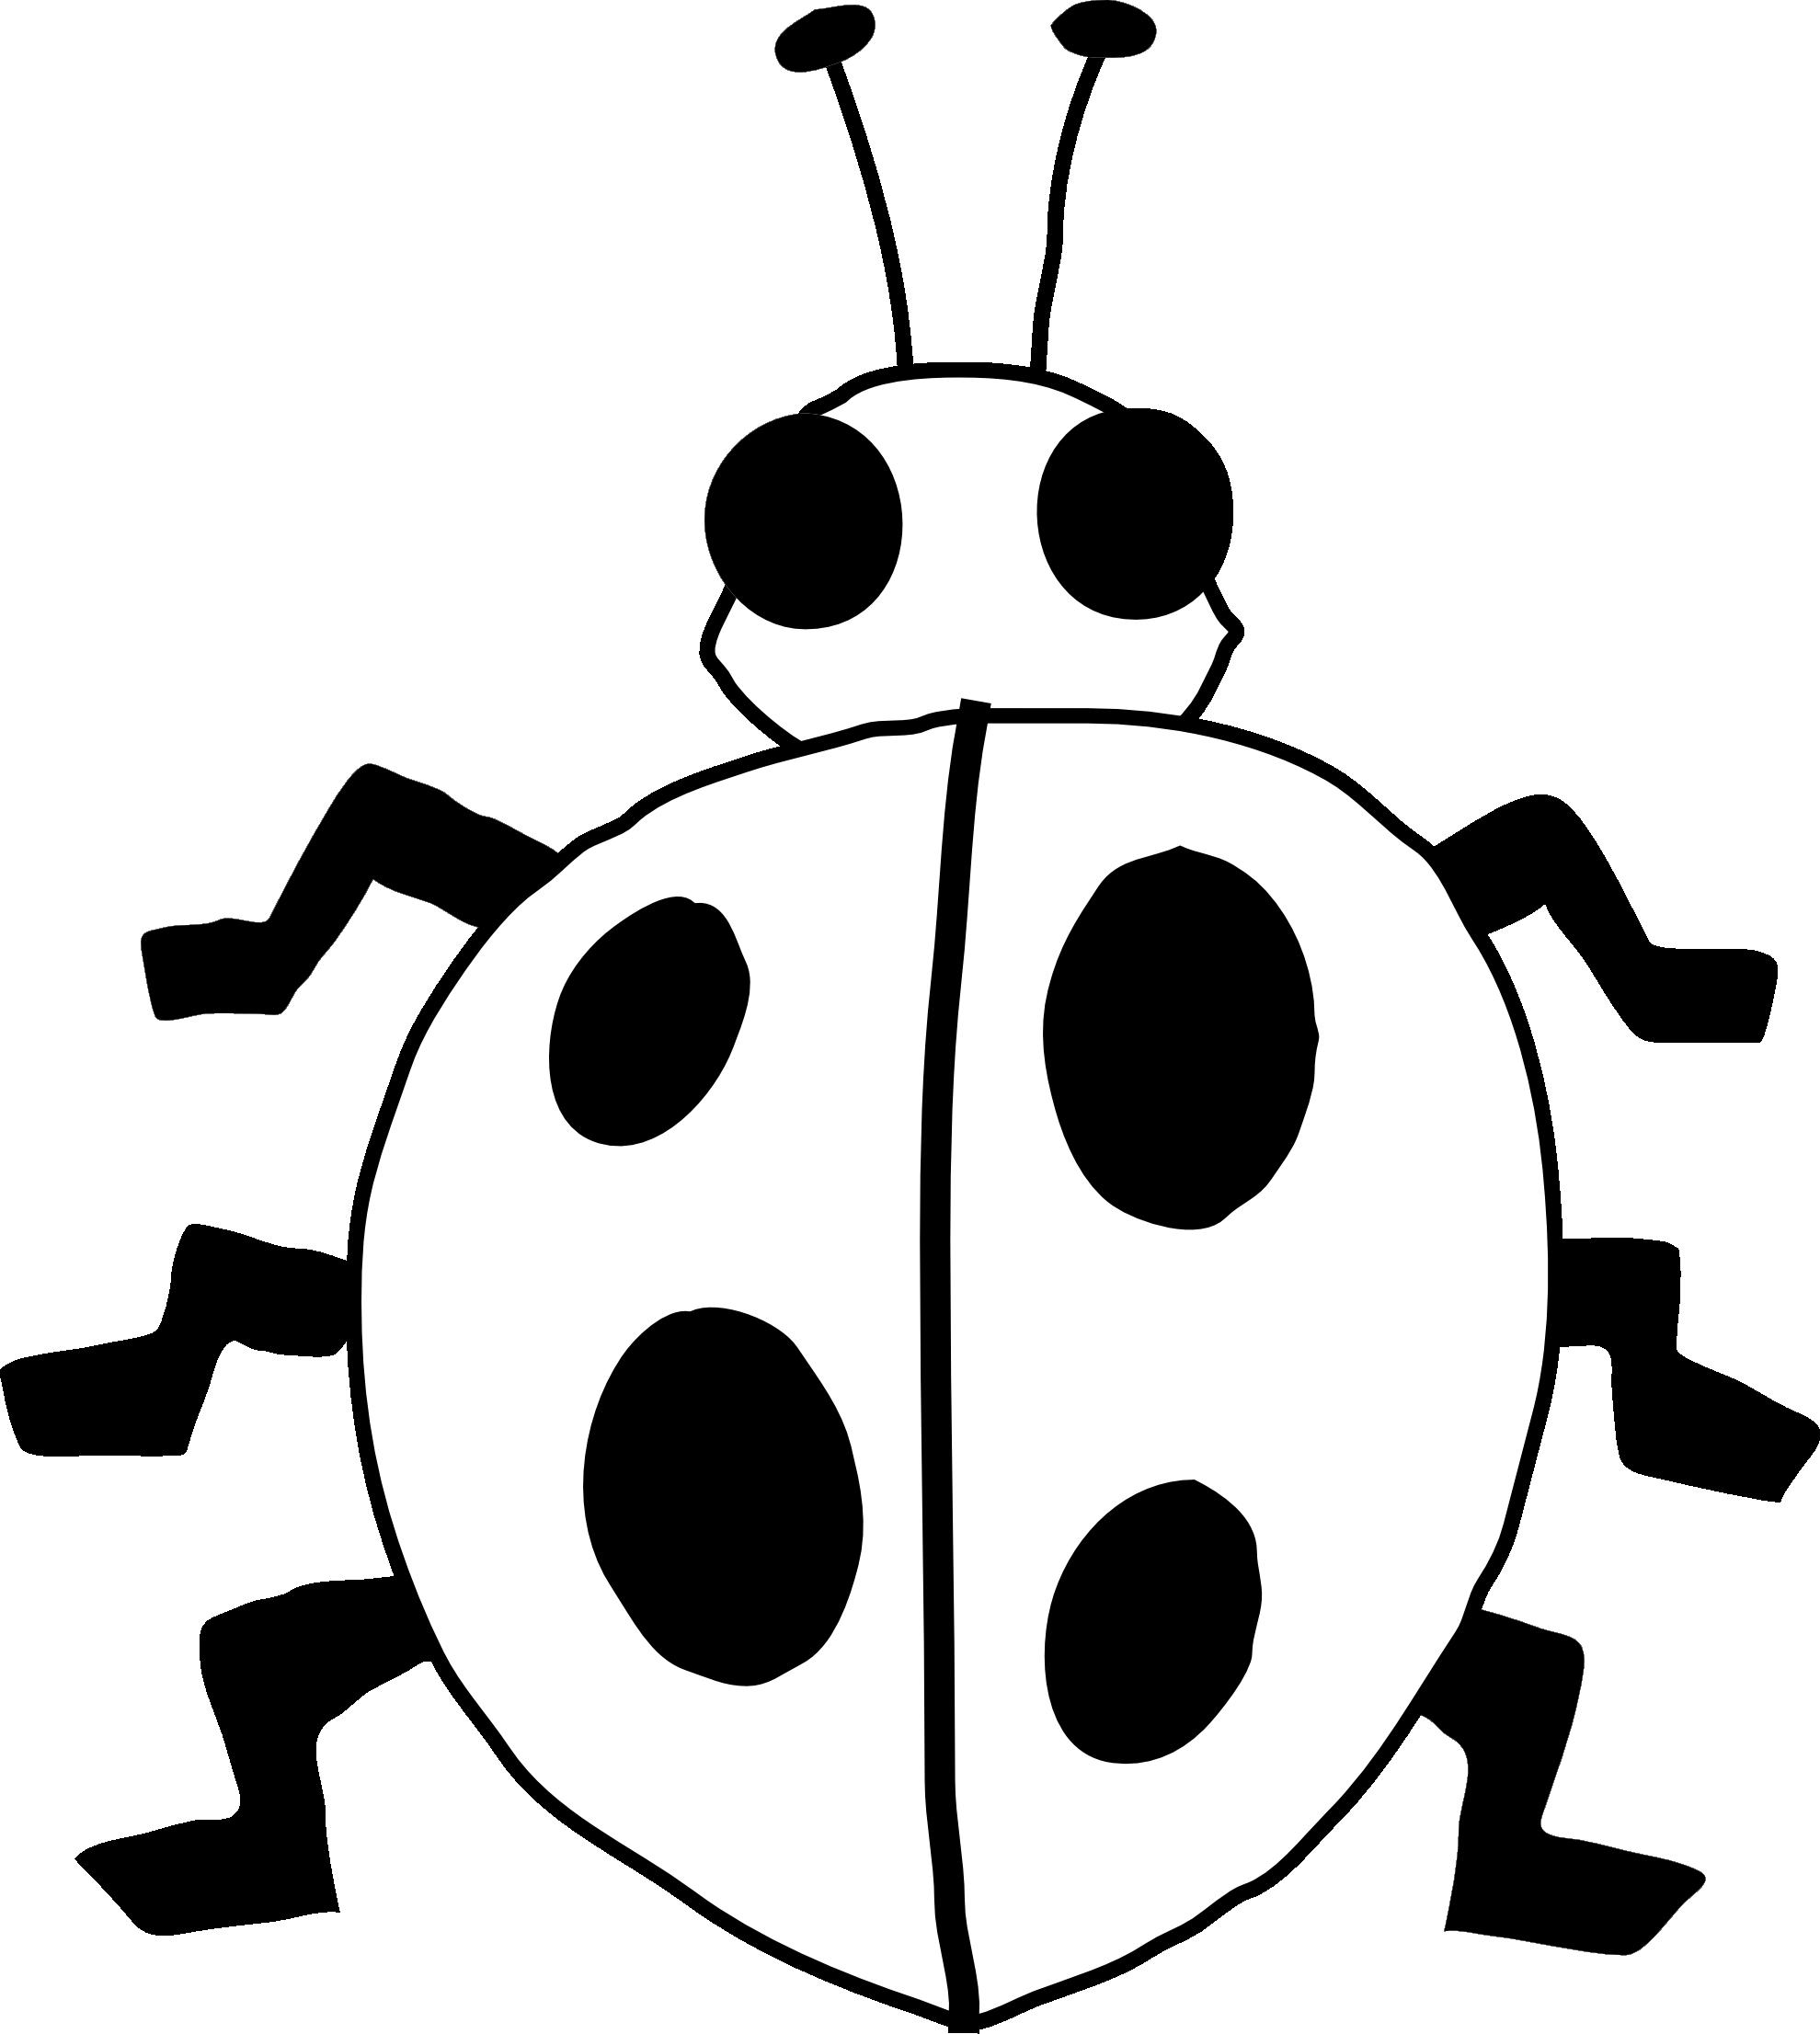 Ladybug clipart banner. Black and white panda